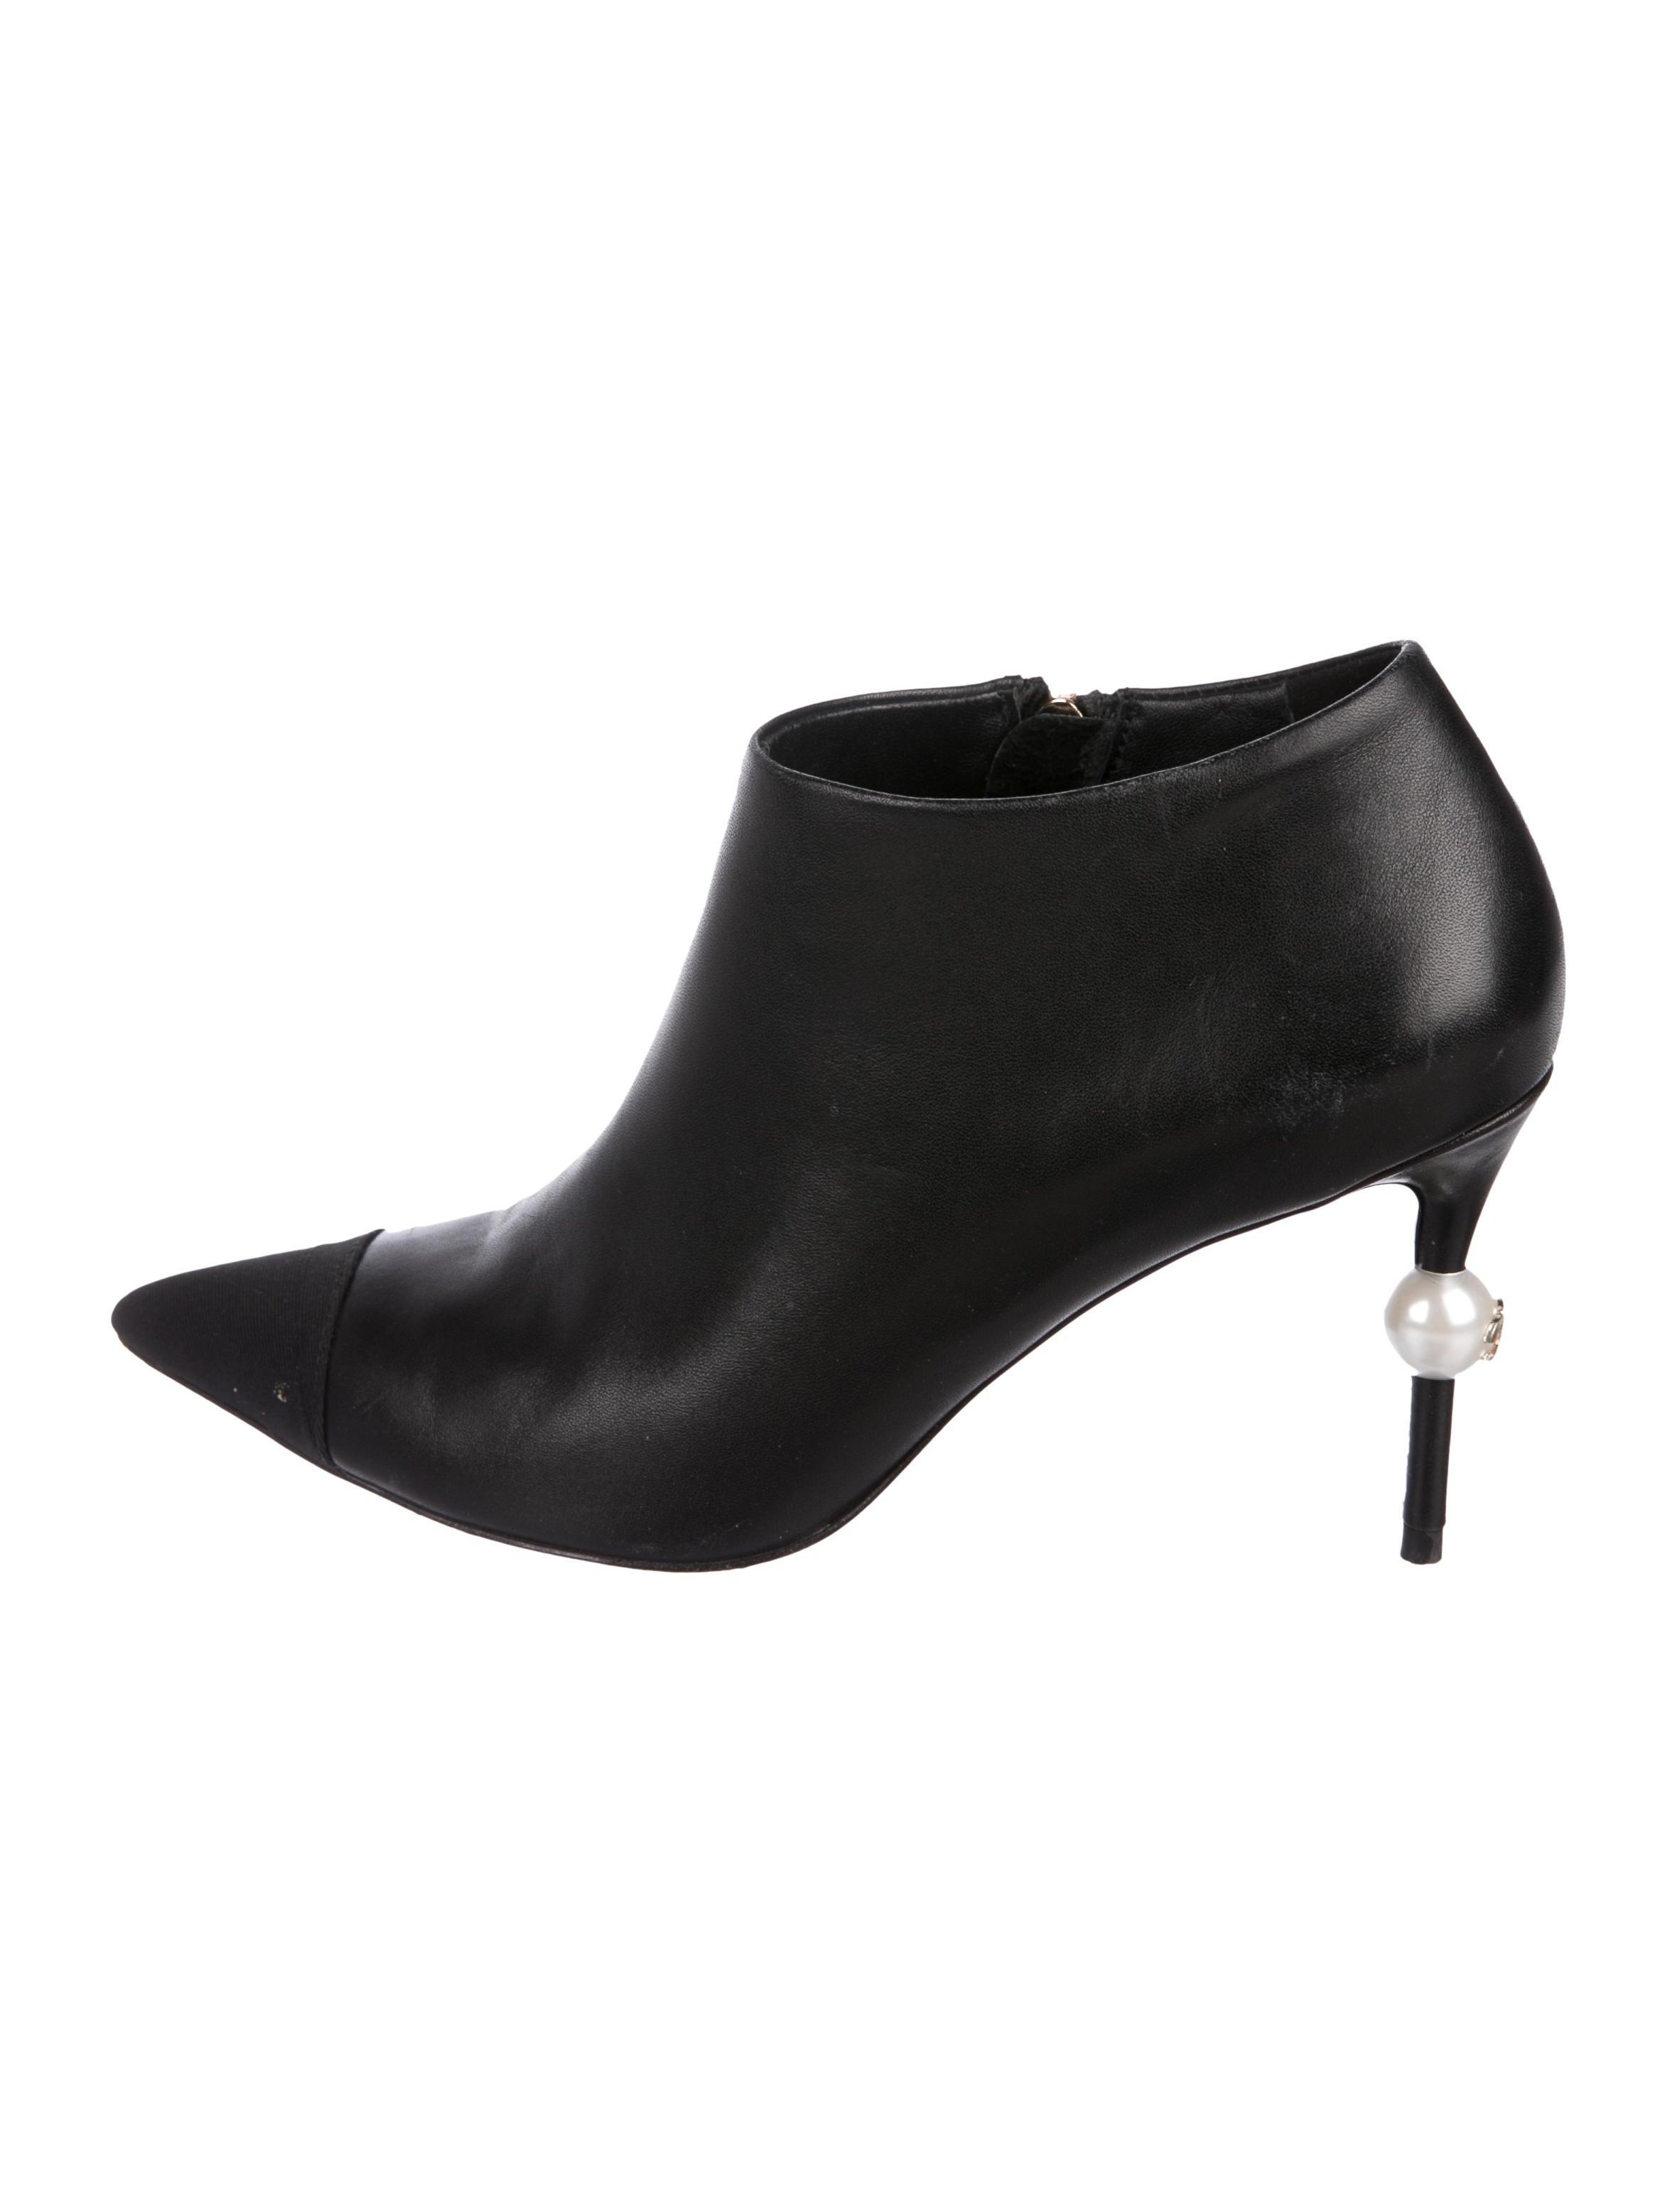 067ab7b77405 Chanel Boots